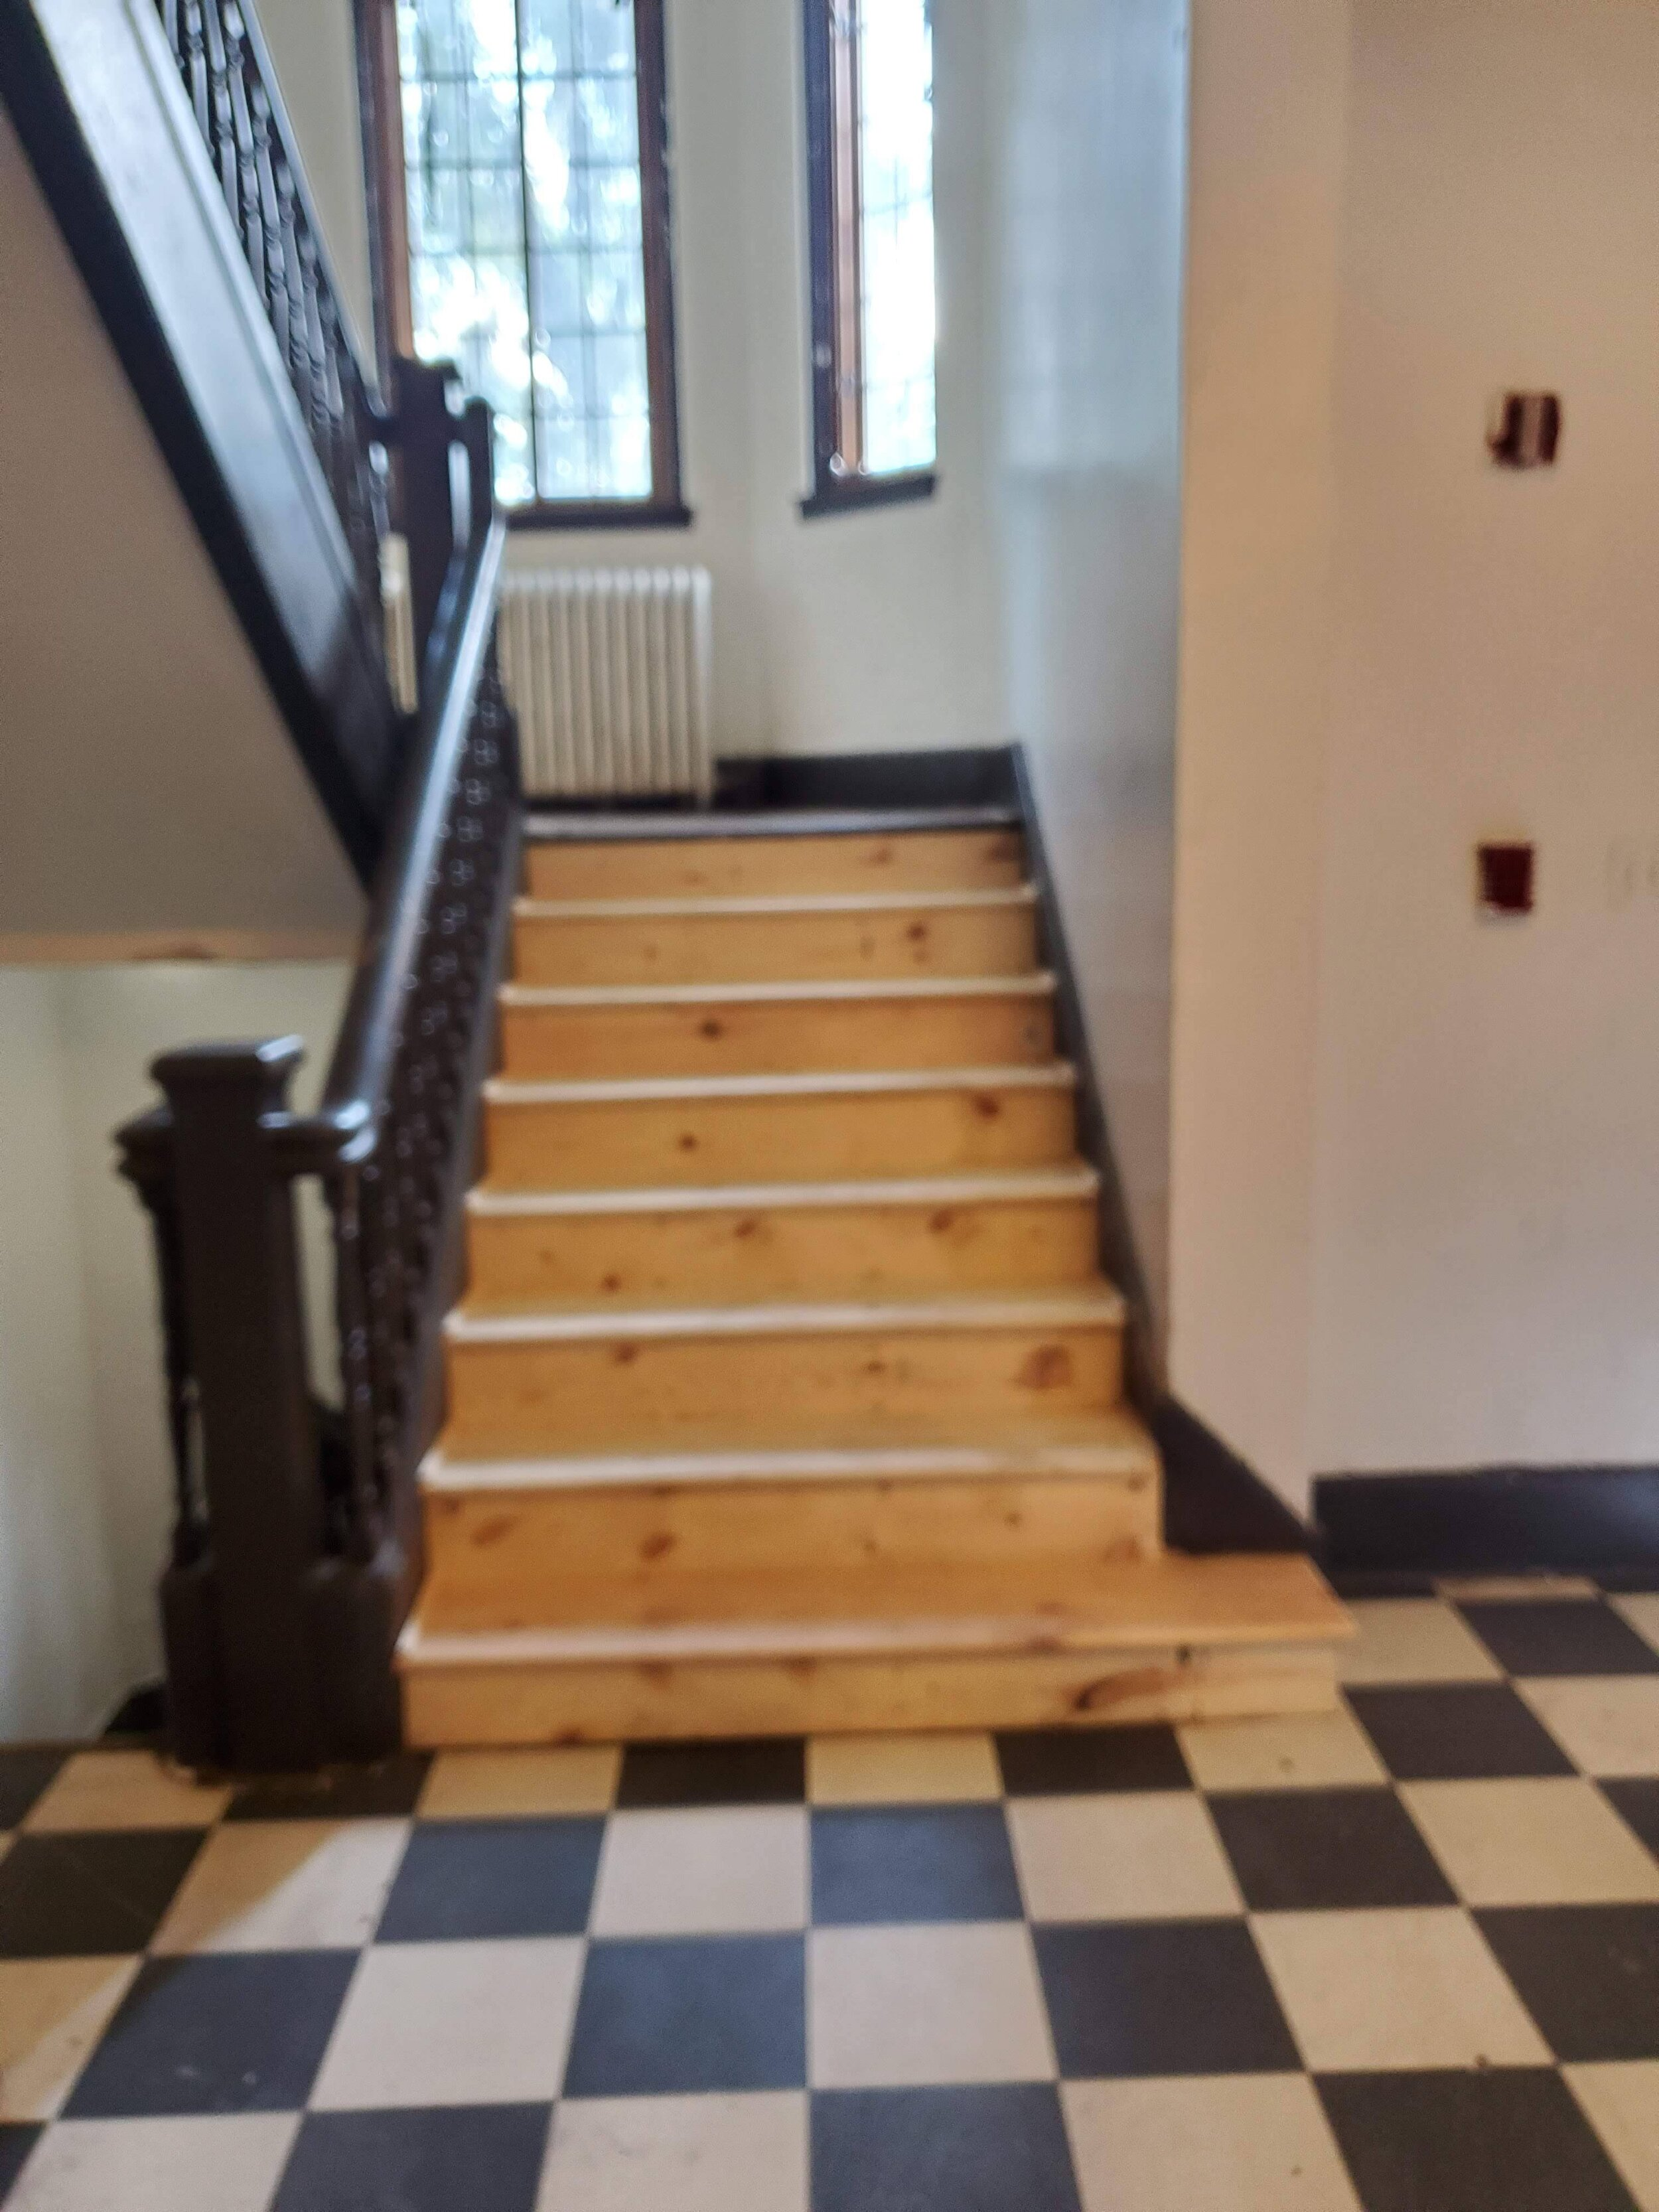 2019 First Floor Front Stair Renovation 20190822_103440.jpg